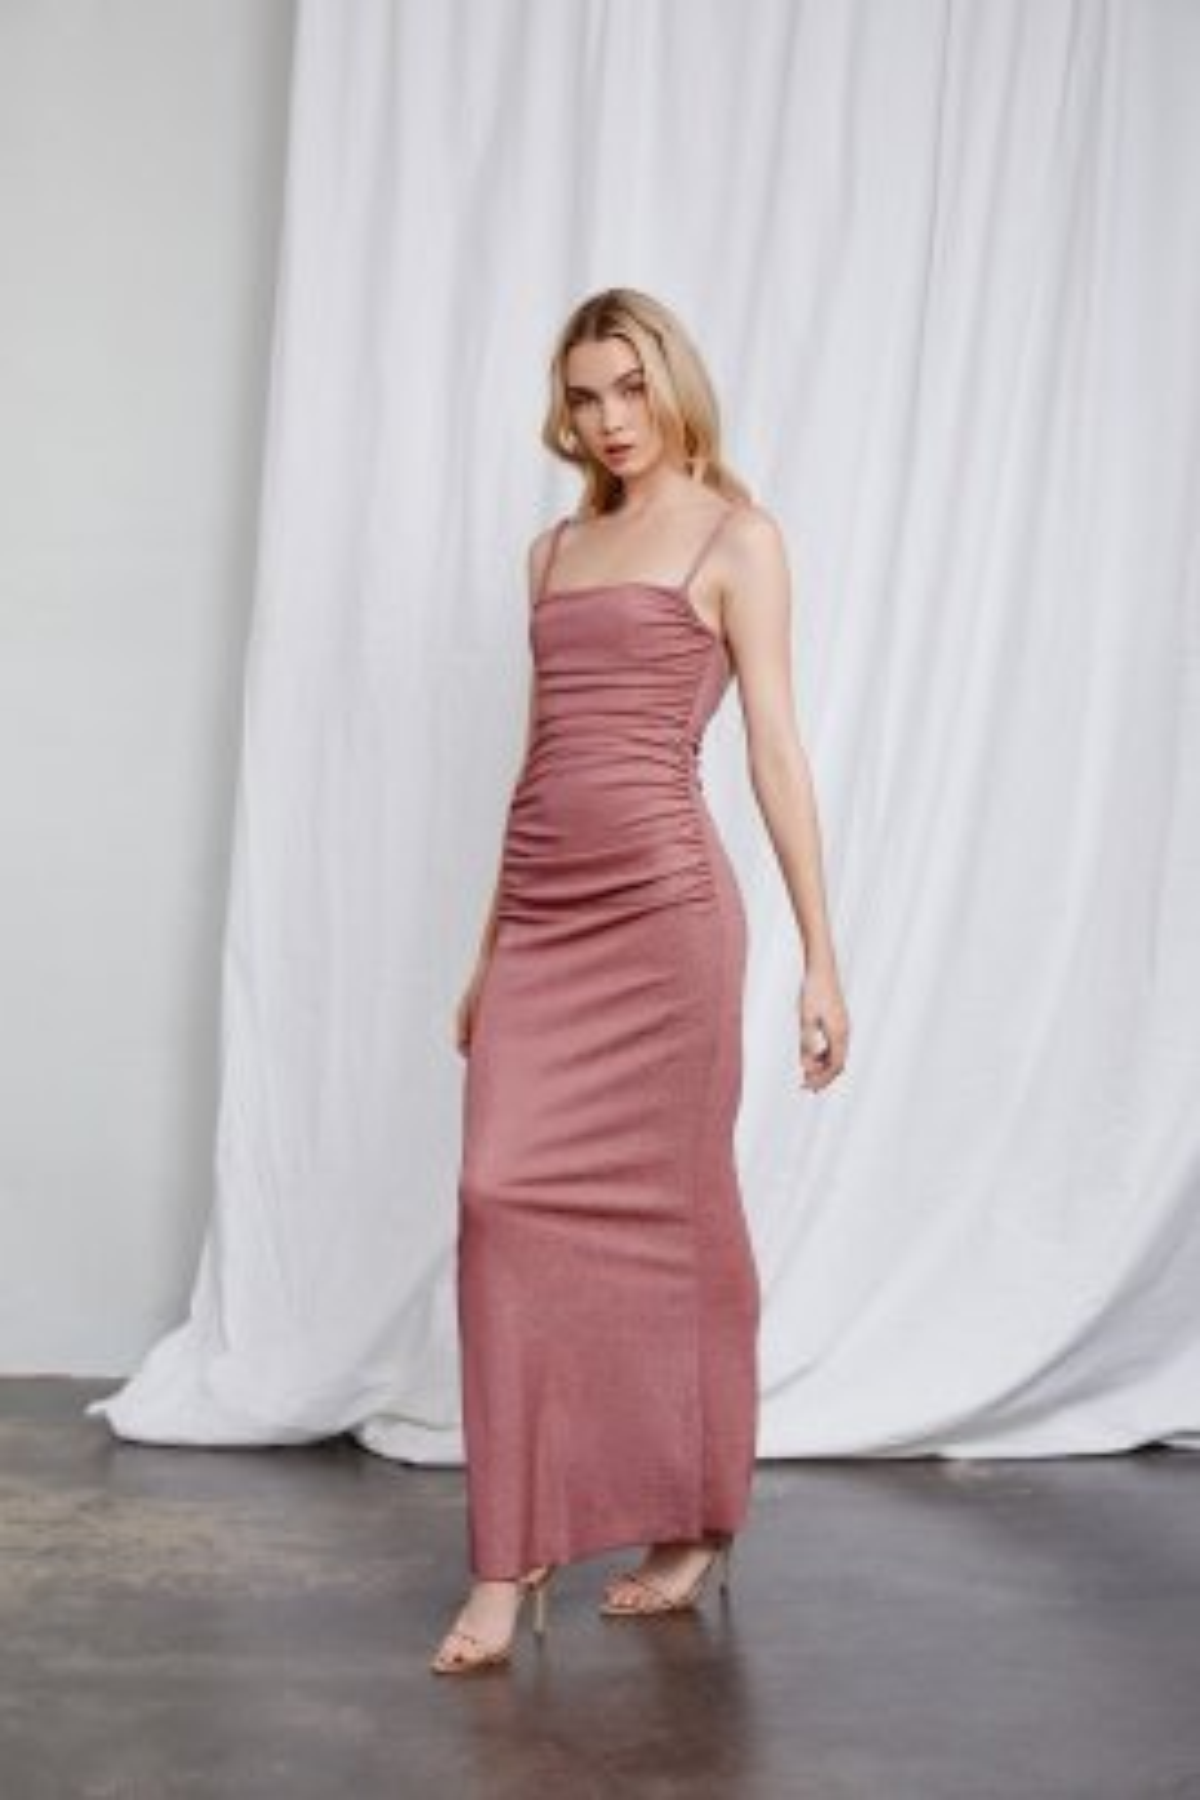 Dalma Rose Elbise